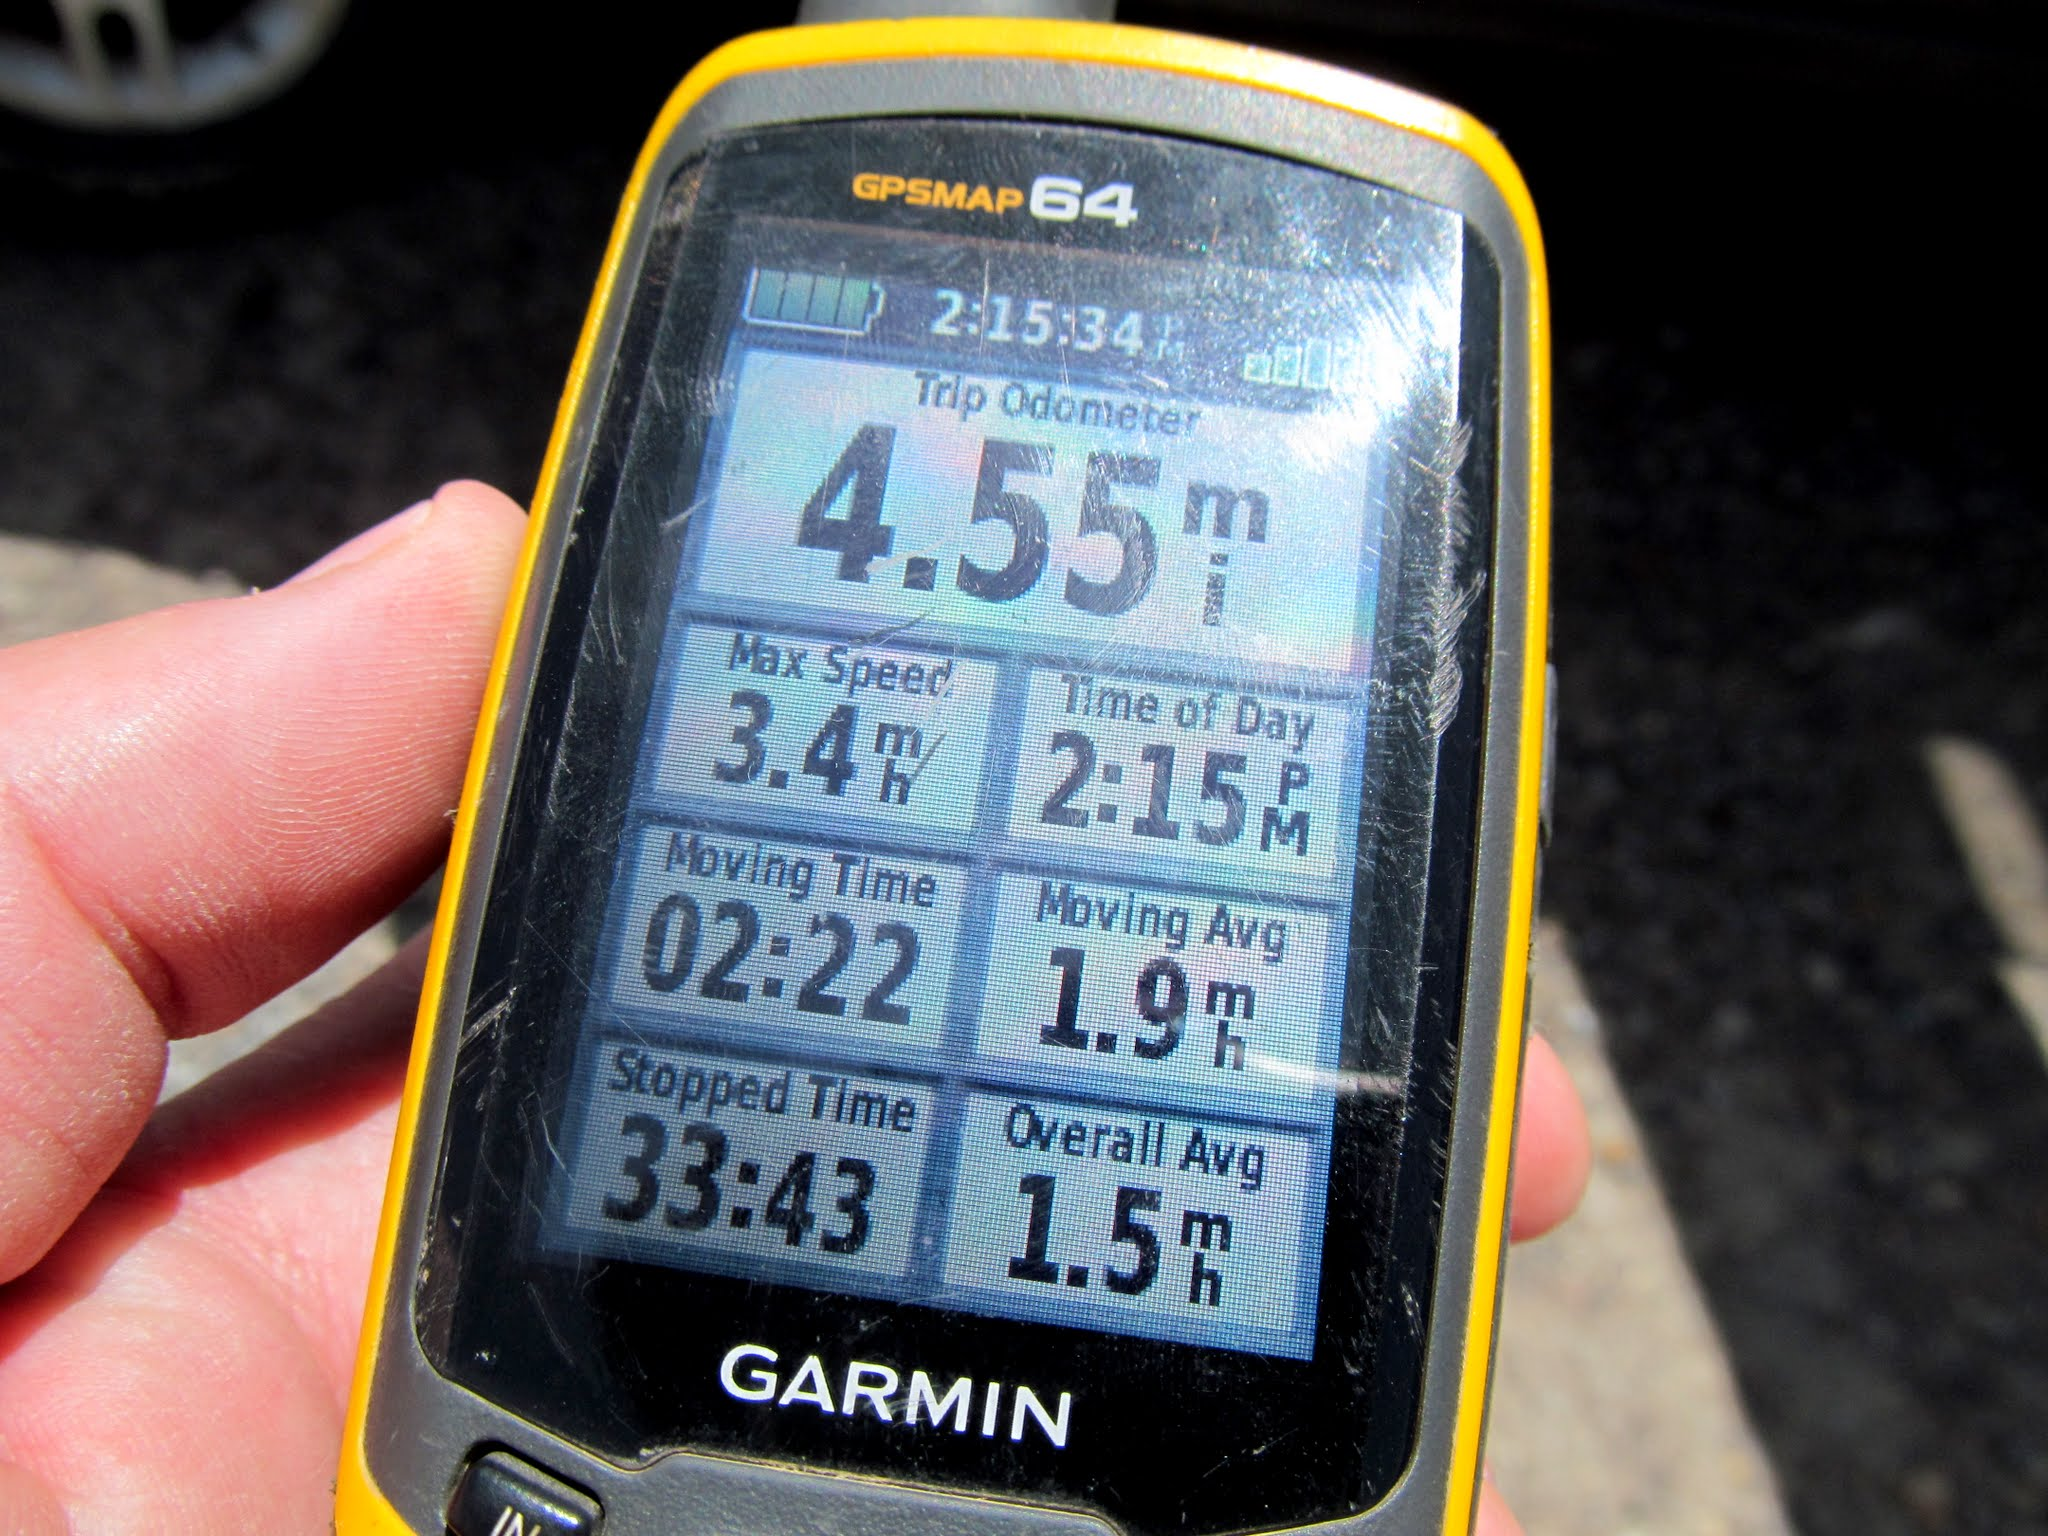 Photo: GPS stats